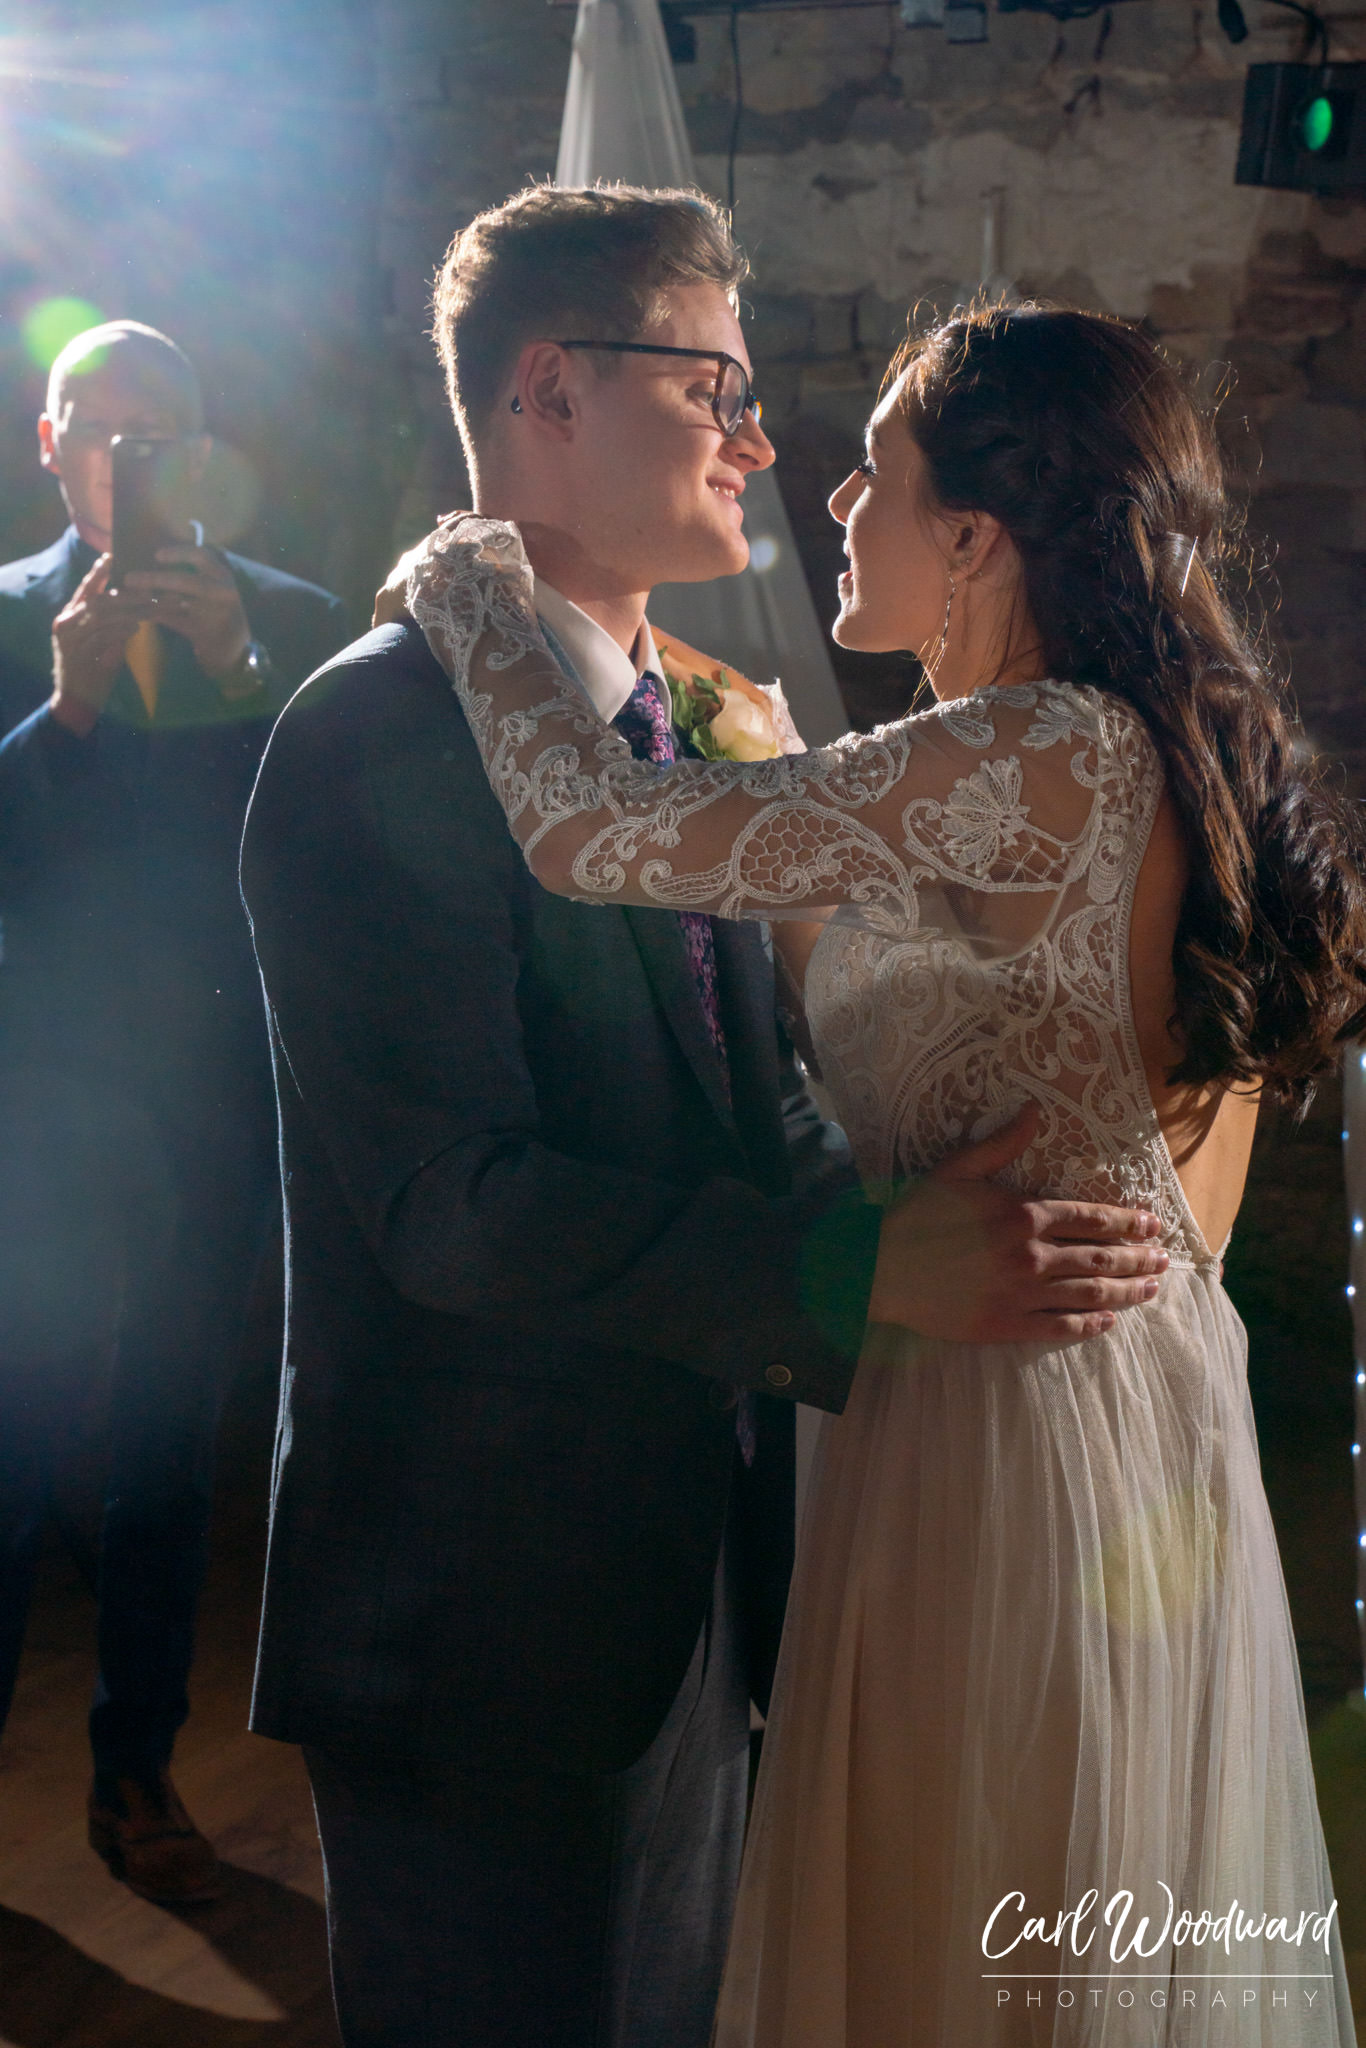 025-pencoed-house-estate-wedding-wedding-photography-cardiff-wedding-photographer.jpg